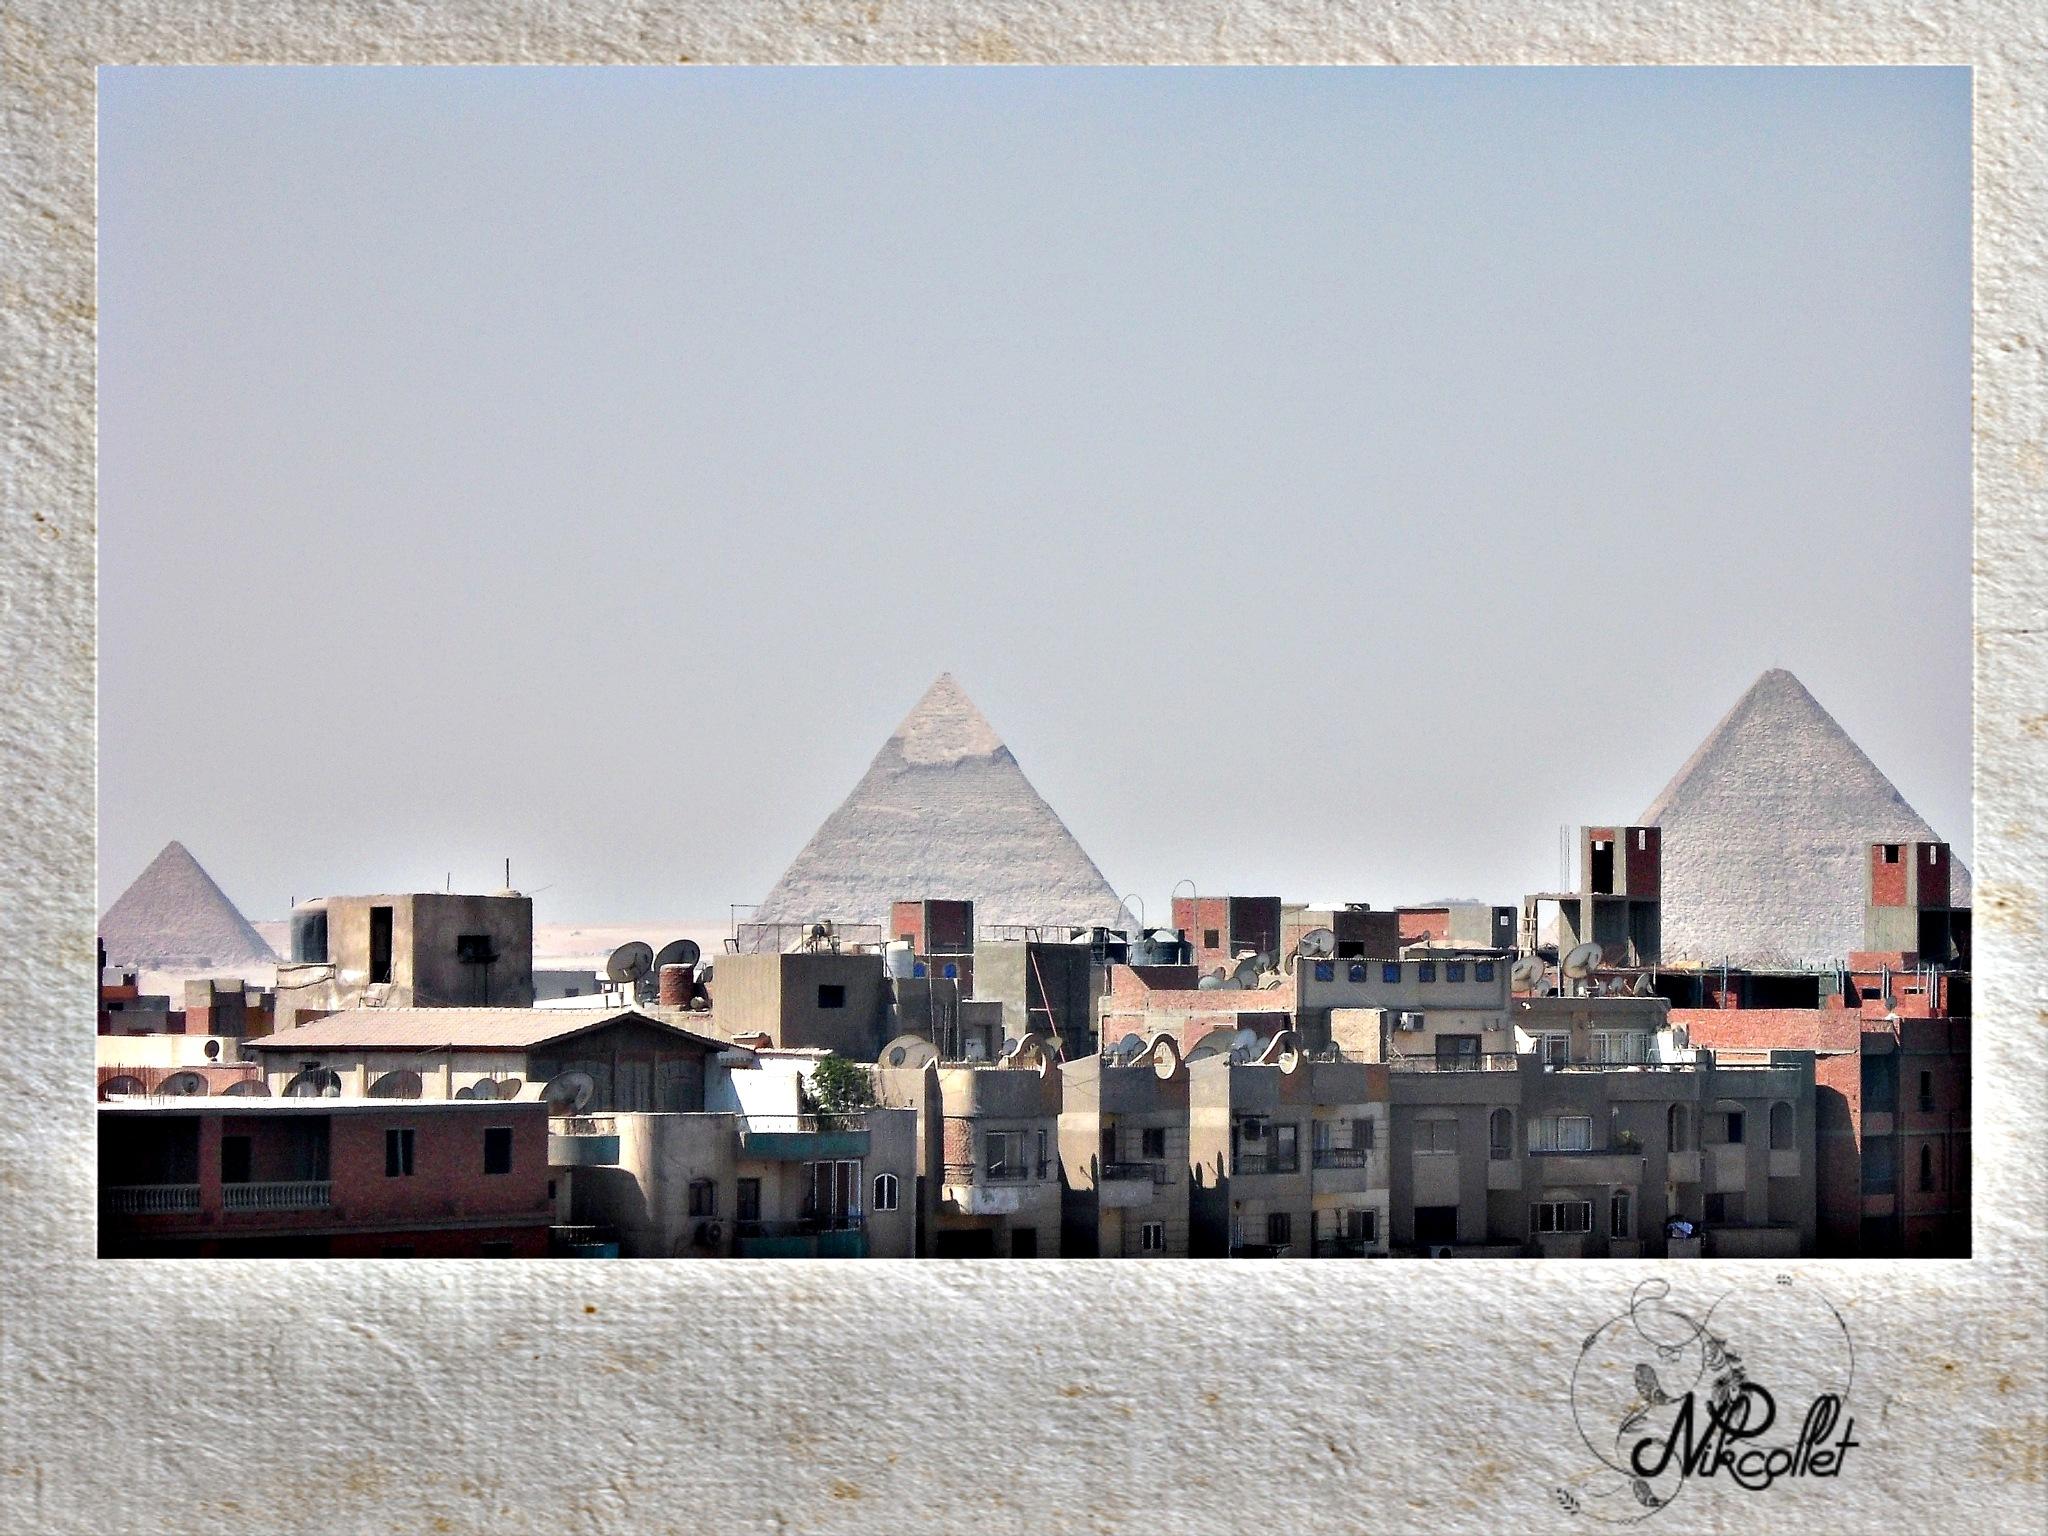 Pyramids by Nikcollet C